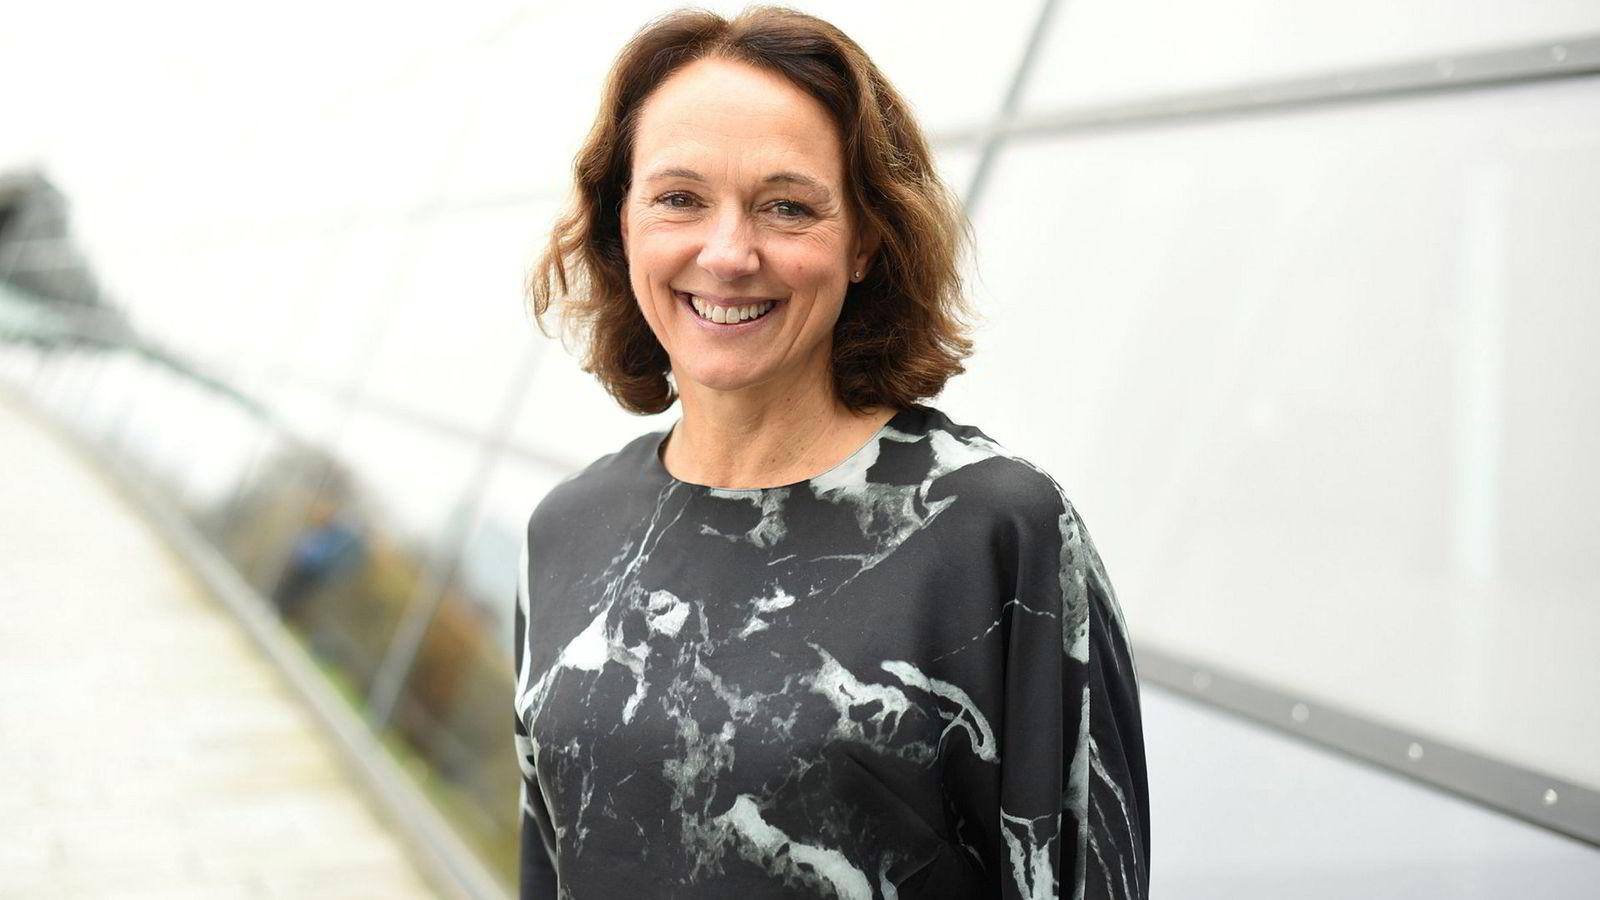 Birgit Bjørnsen er leder for tv og fastnett i Telenor Norge / Canal Digital Kabel.